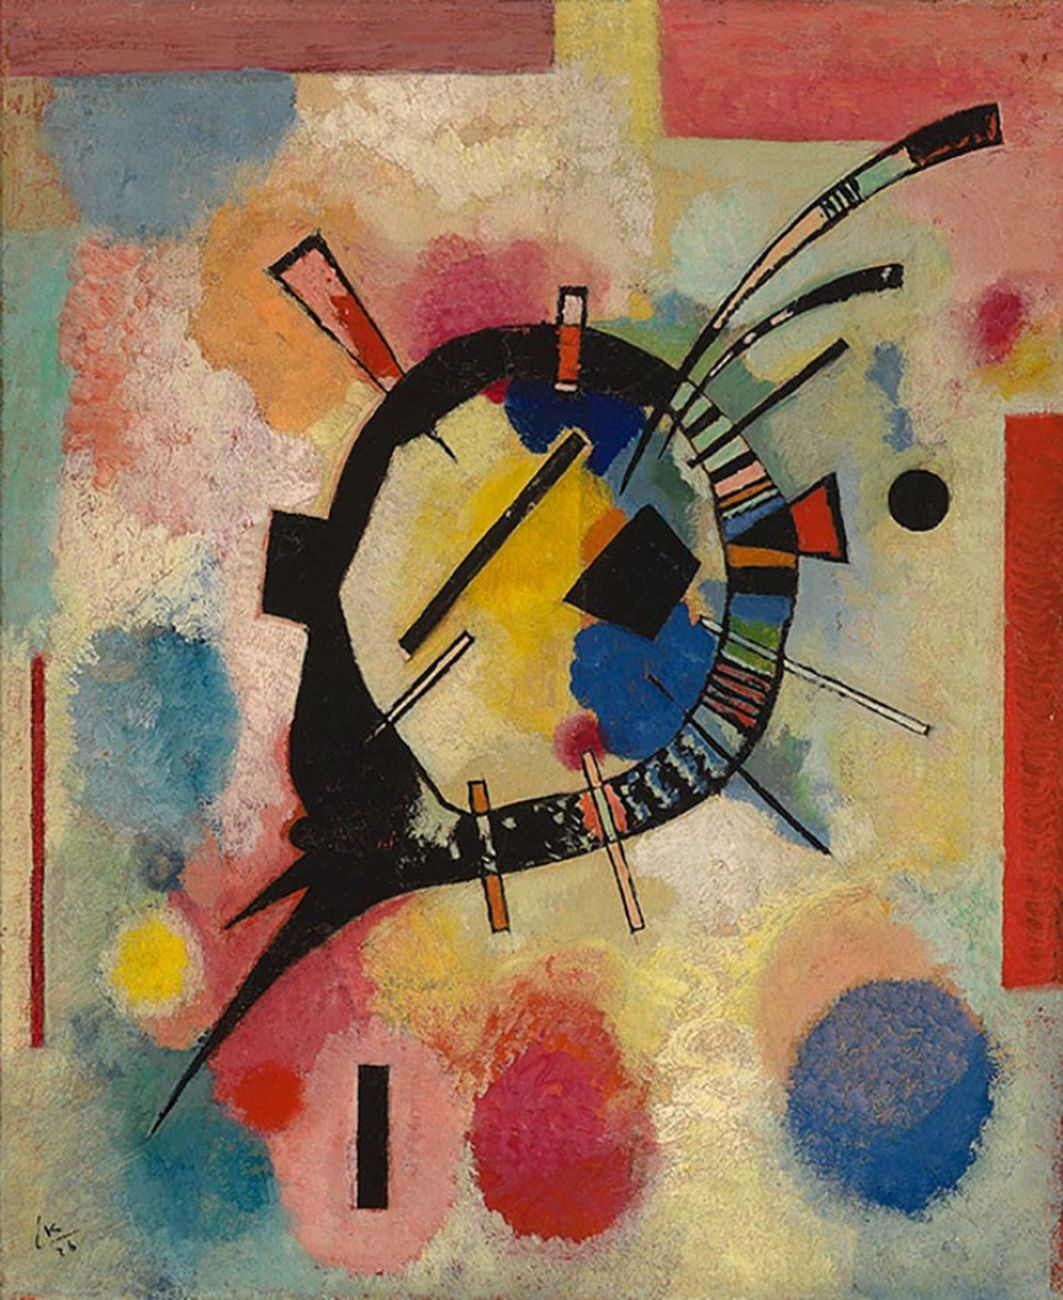 Wassily Kandinsky, Gelbe Mitte, 1926. Museum Boijmans Van Beuningen, Rotterdam. Photo Studio Tromp